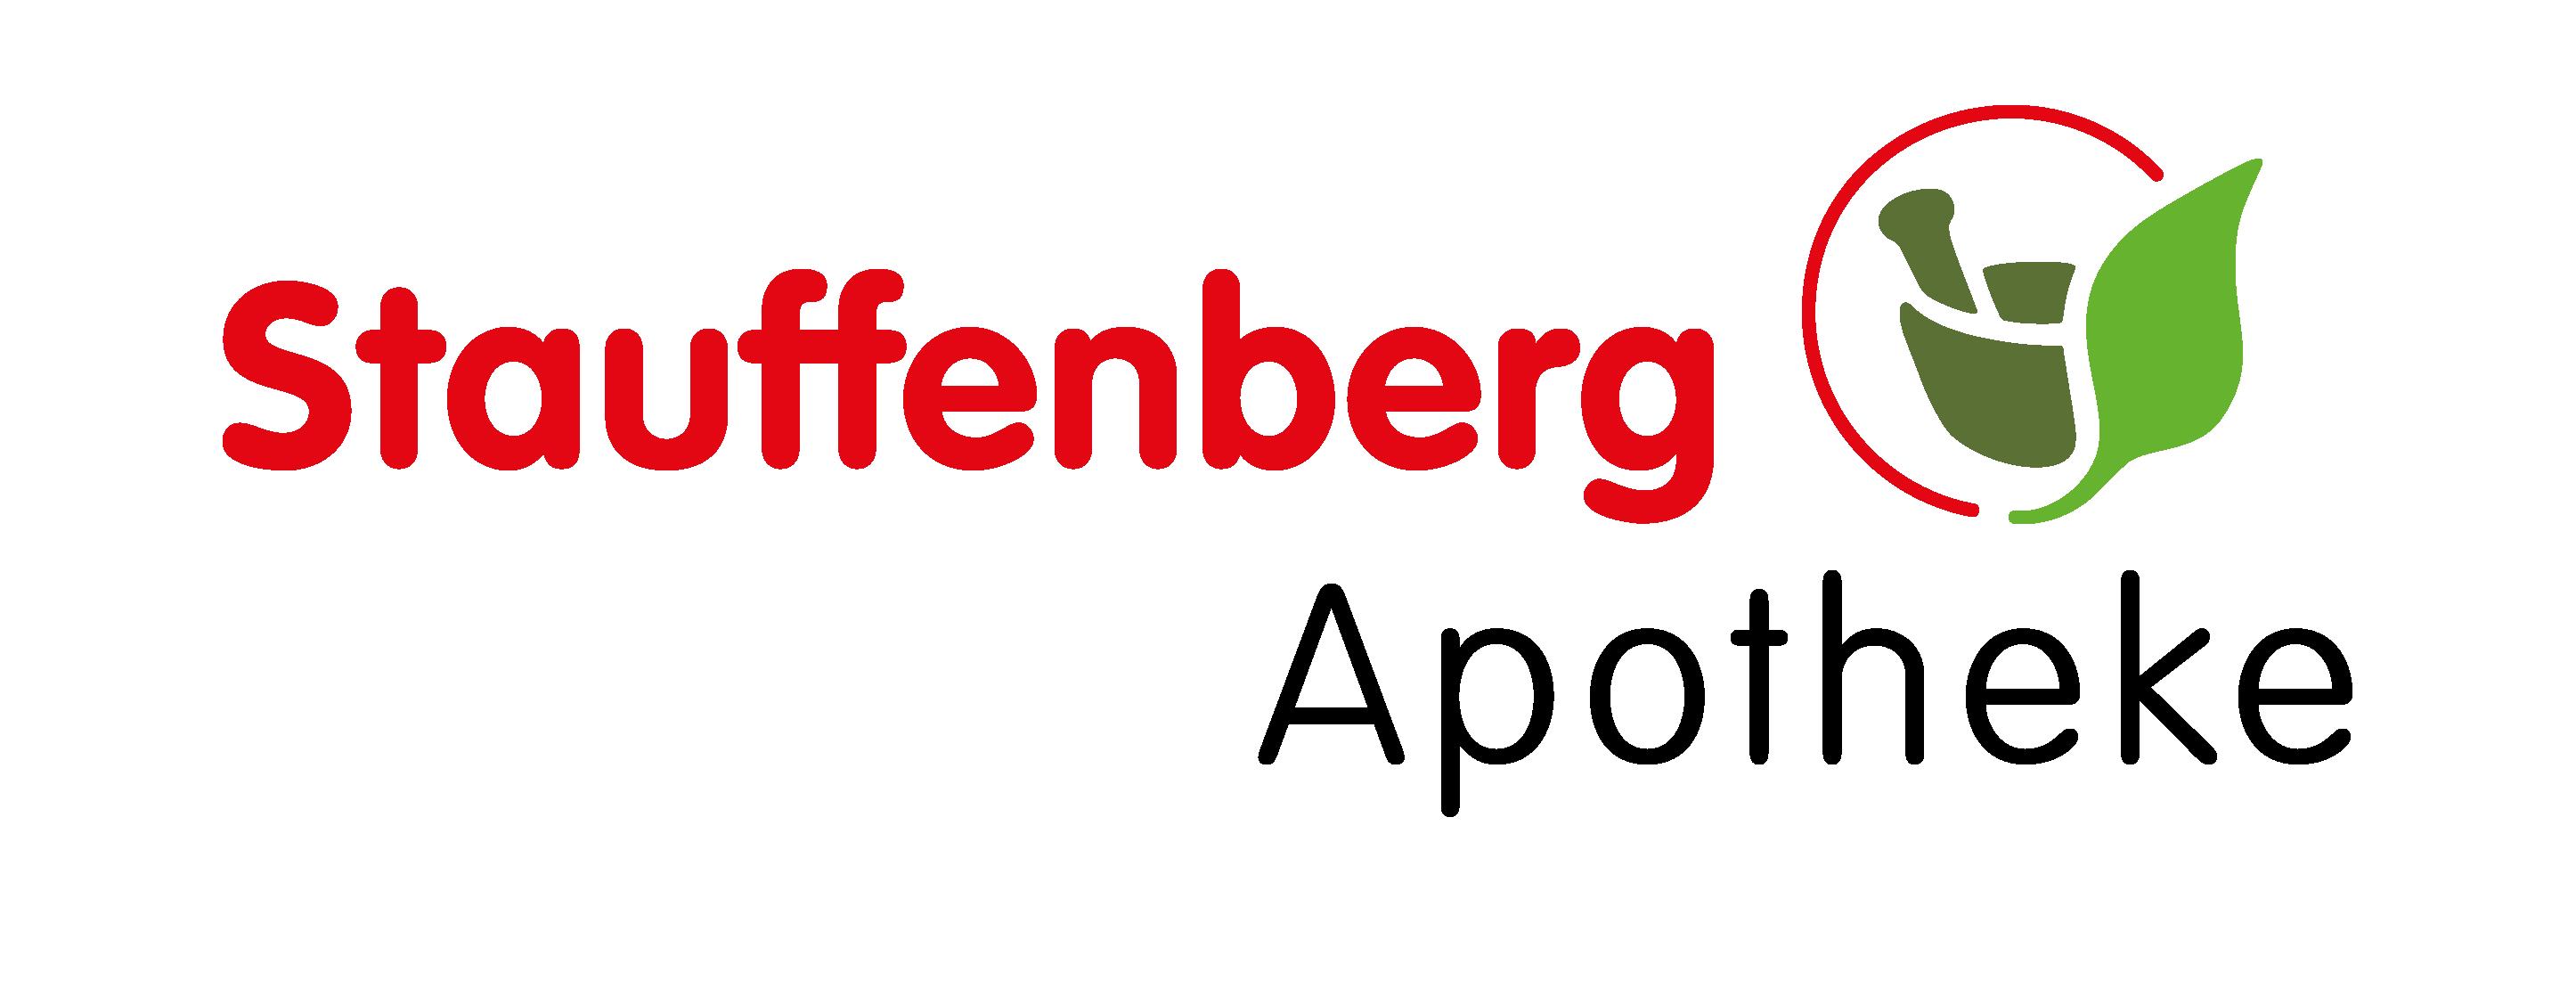 Logo der Stauffenberg-Apotheke